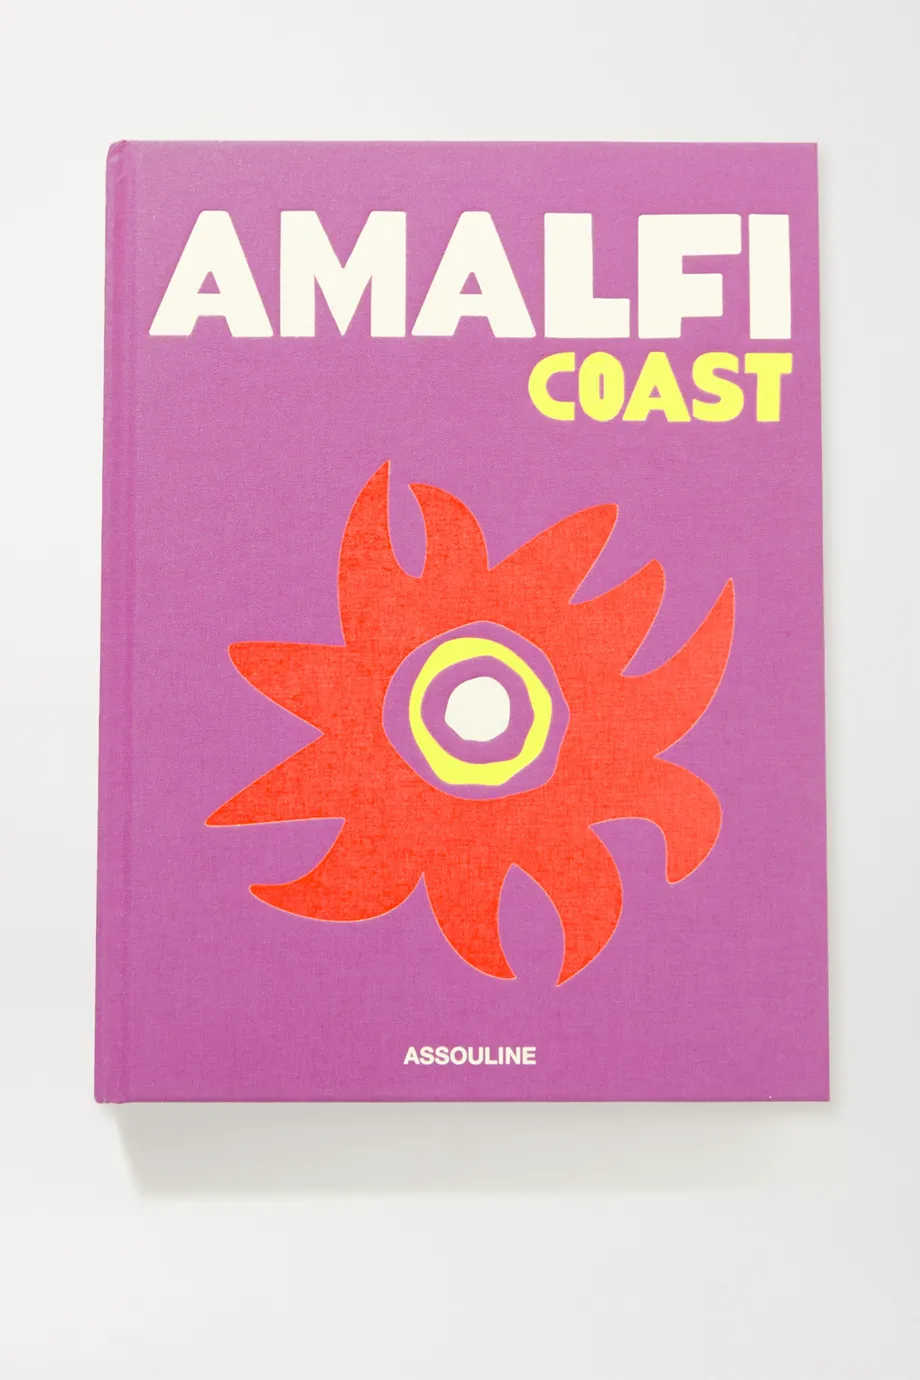 Amalfi Coast by Carlos Souza hardcover book